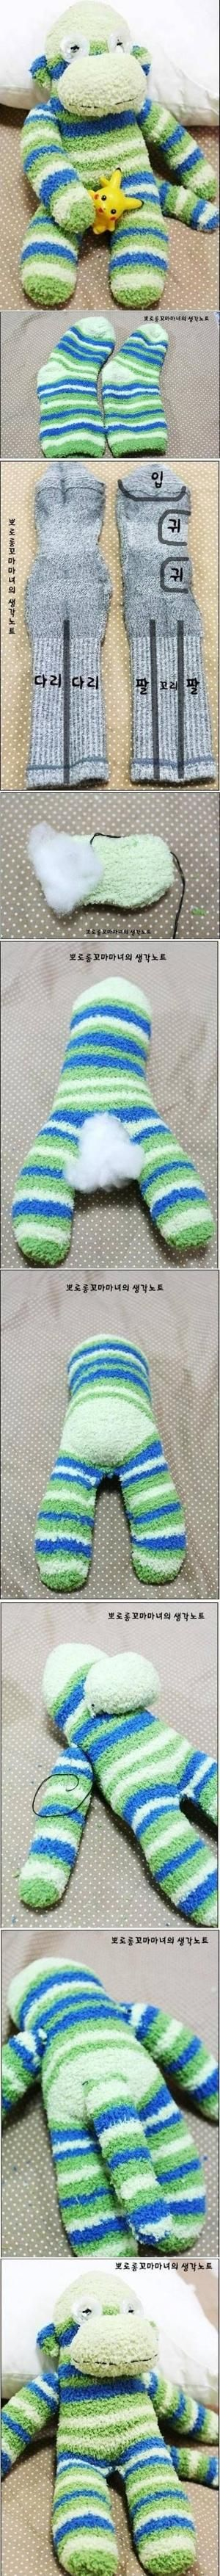 DIY Sock Monkey Terry by CrisC